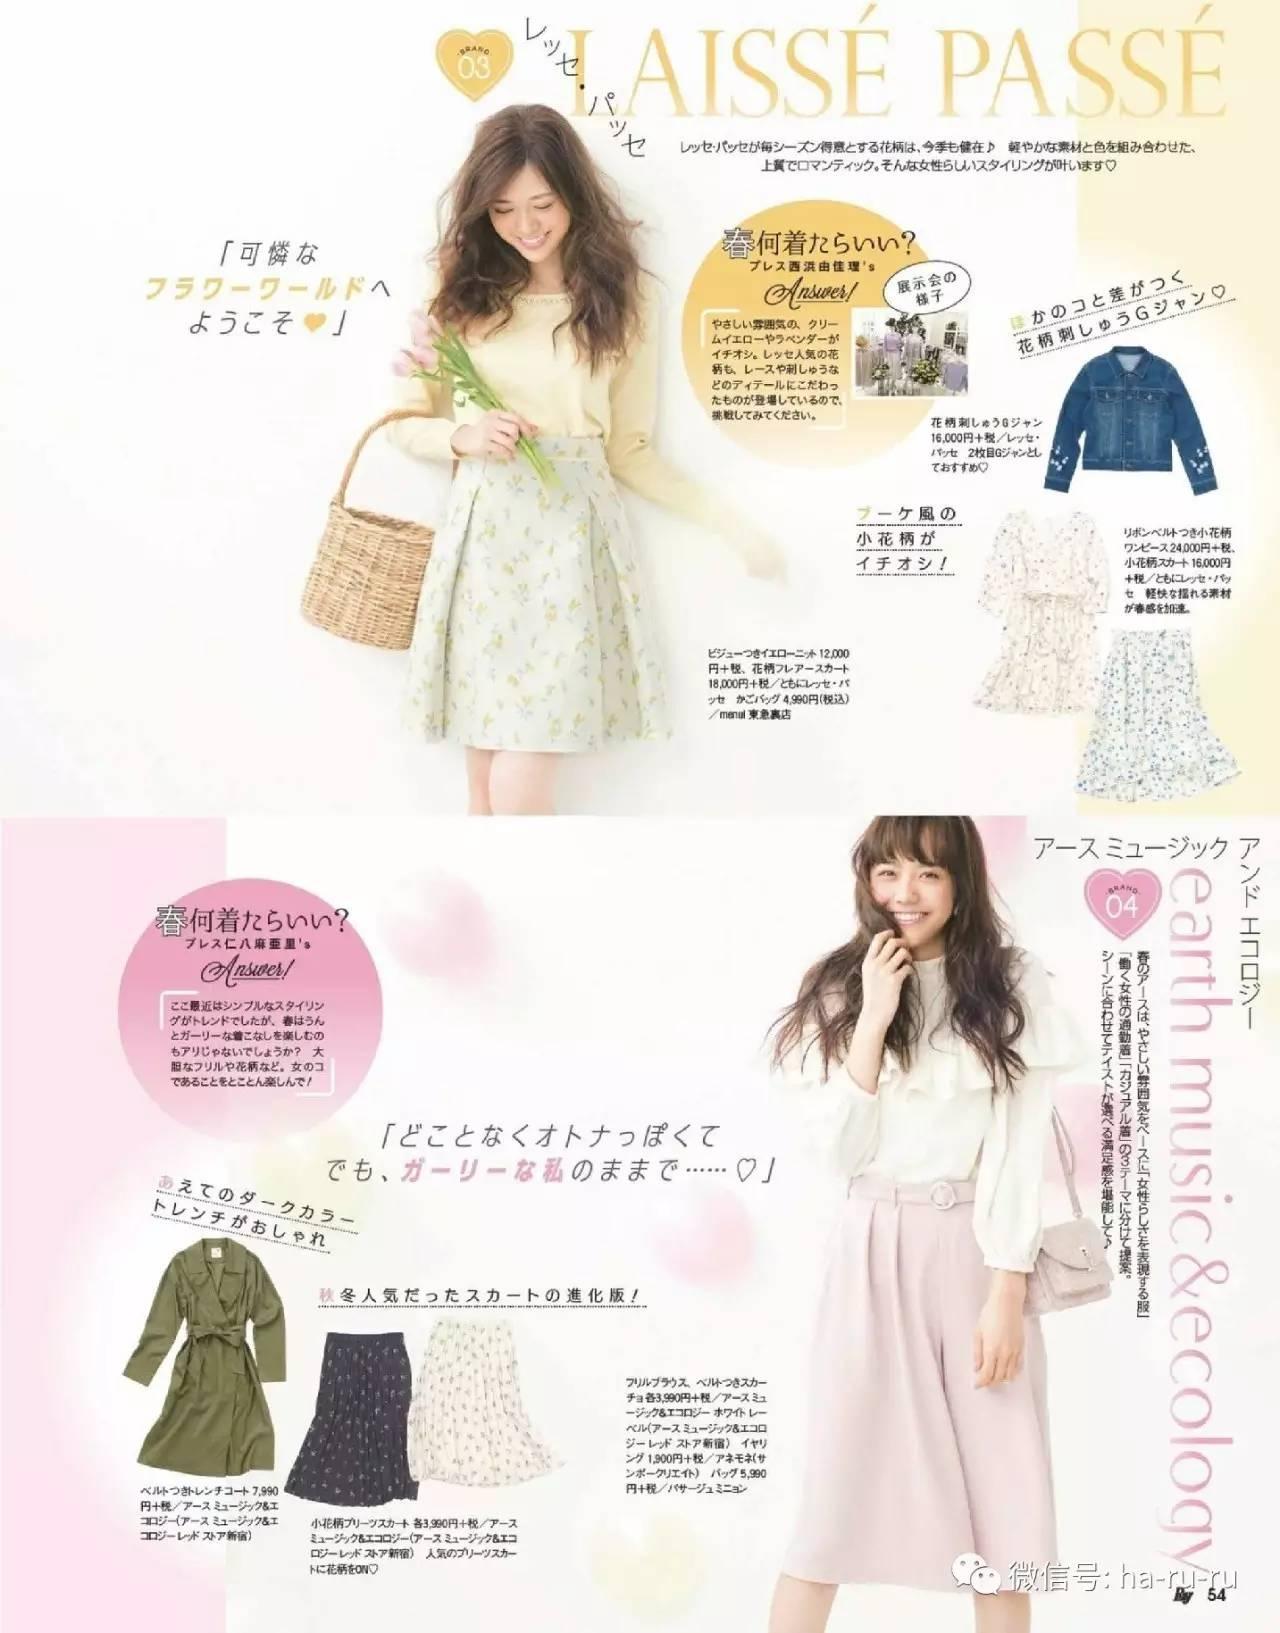 models: 鹿沼忧妃,白石麻衣 models: 松井爱莉,佐藤晴美 models